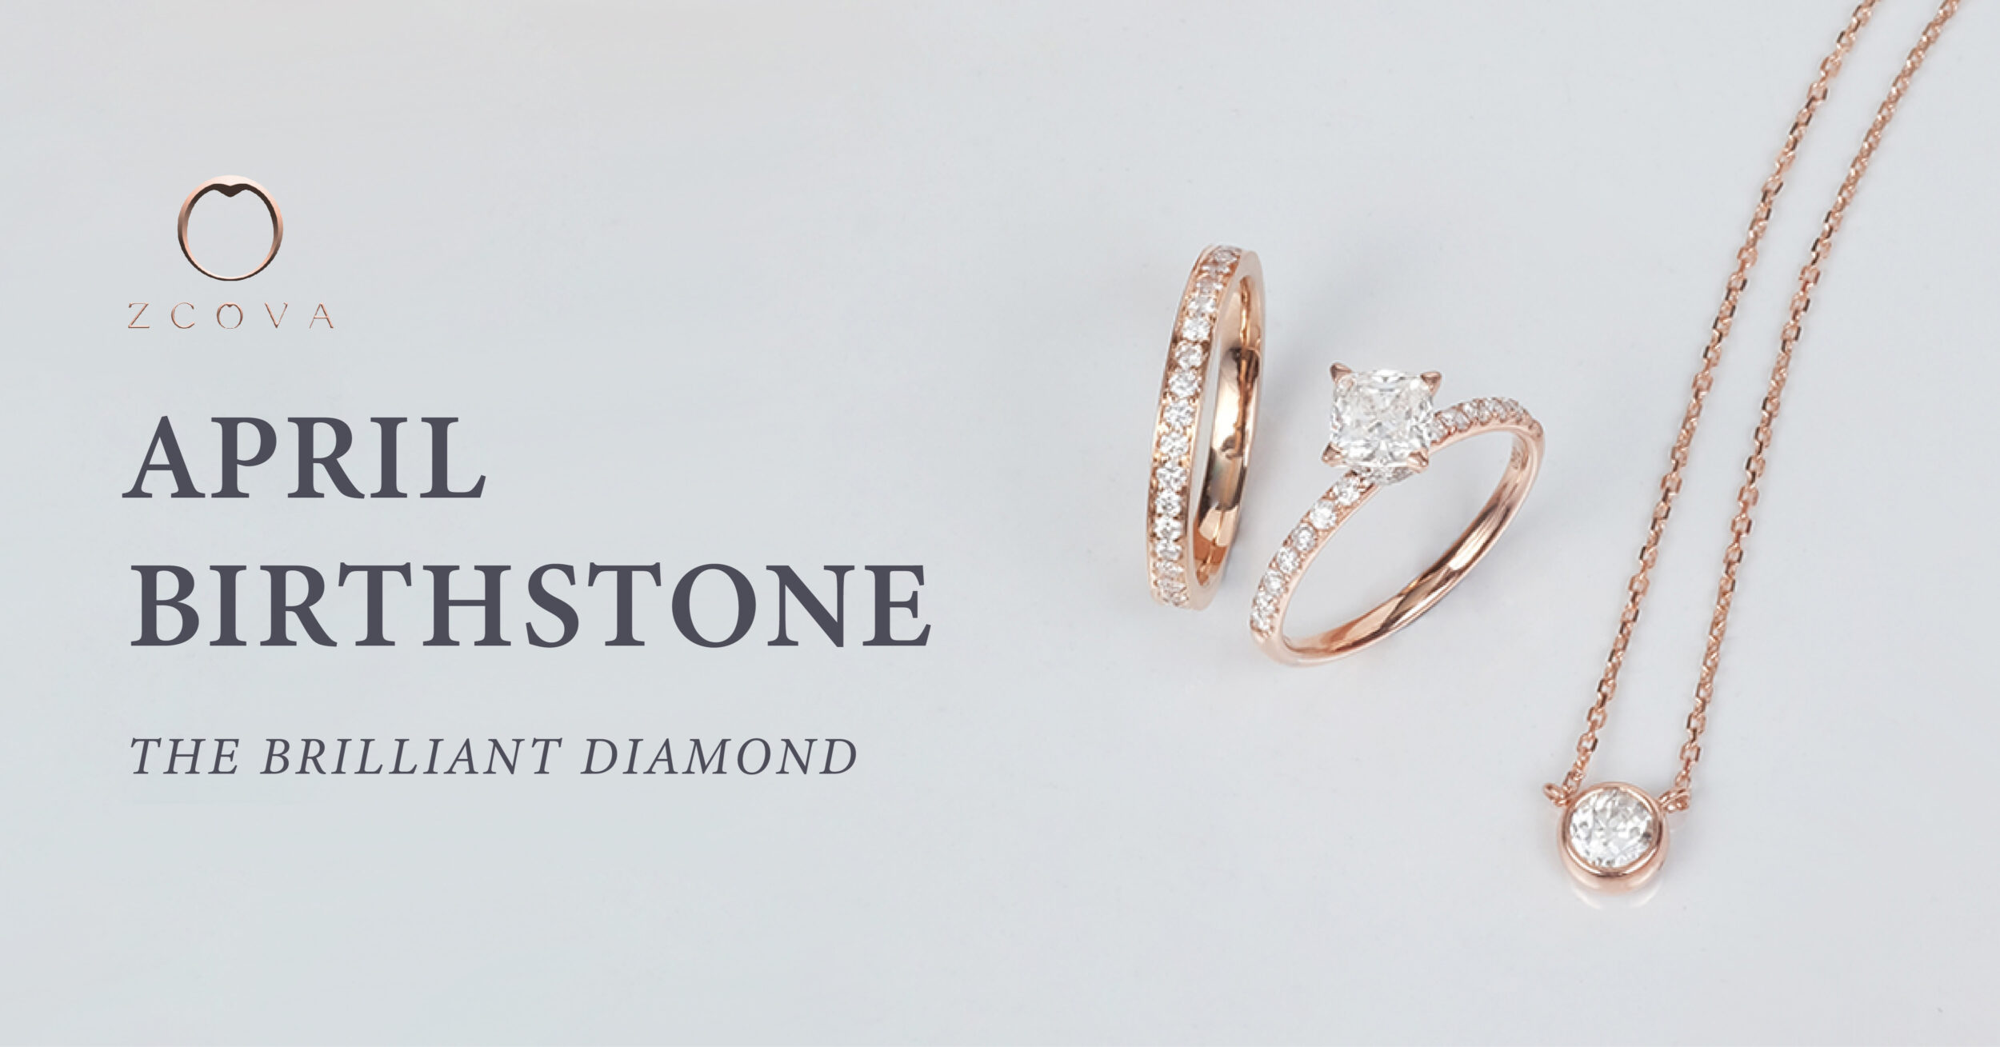 april birthstone brilliant diamond jewellery zcova